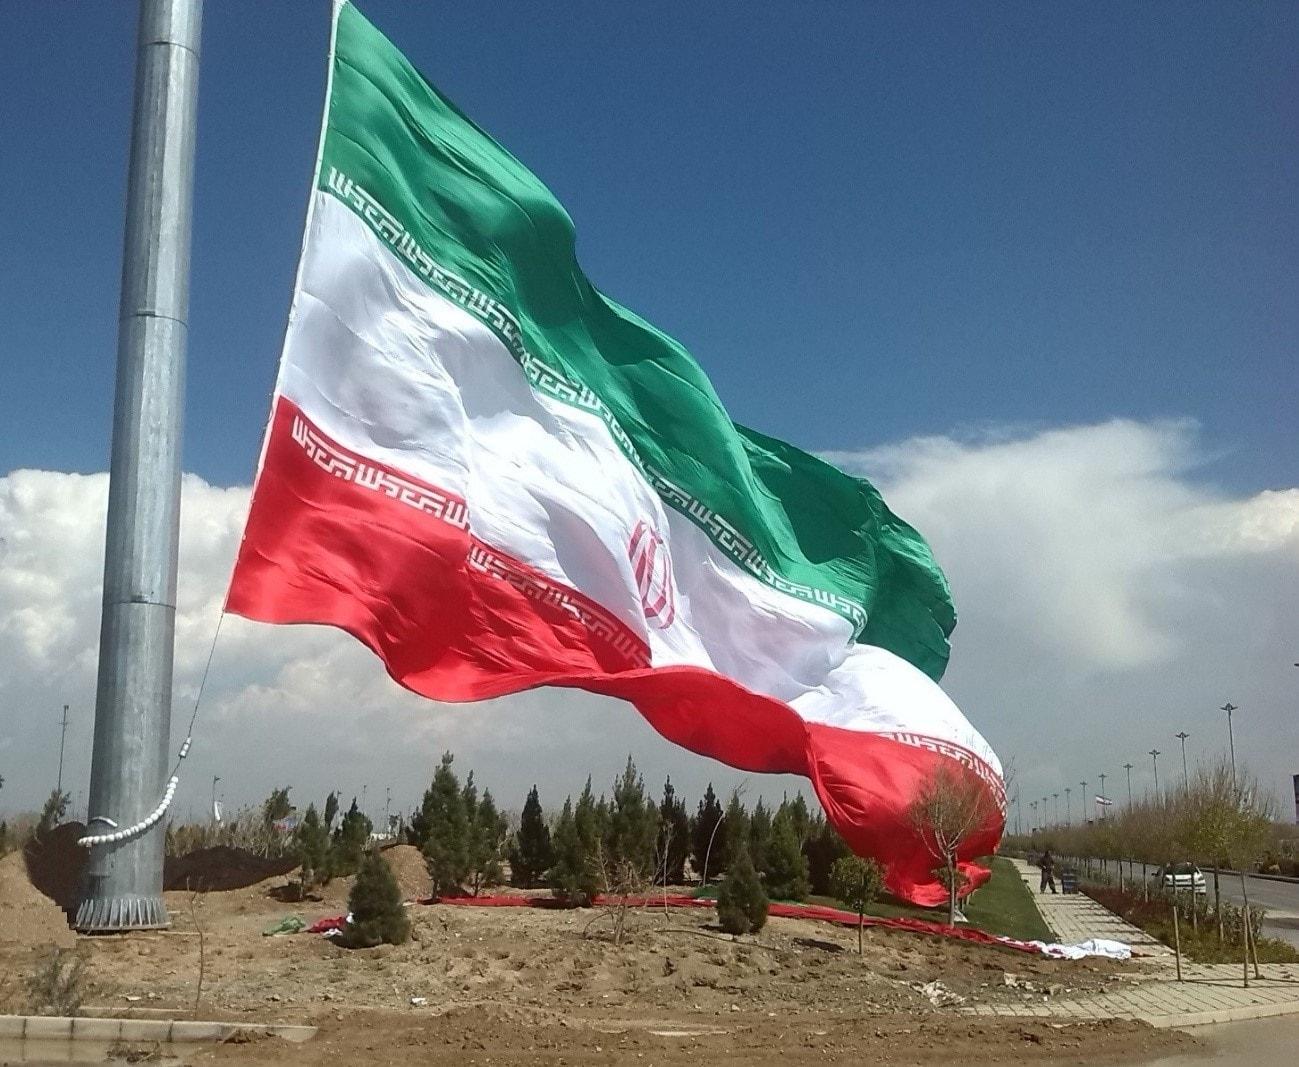 فروش دكل پرچم